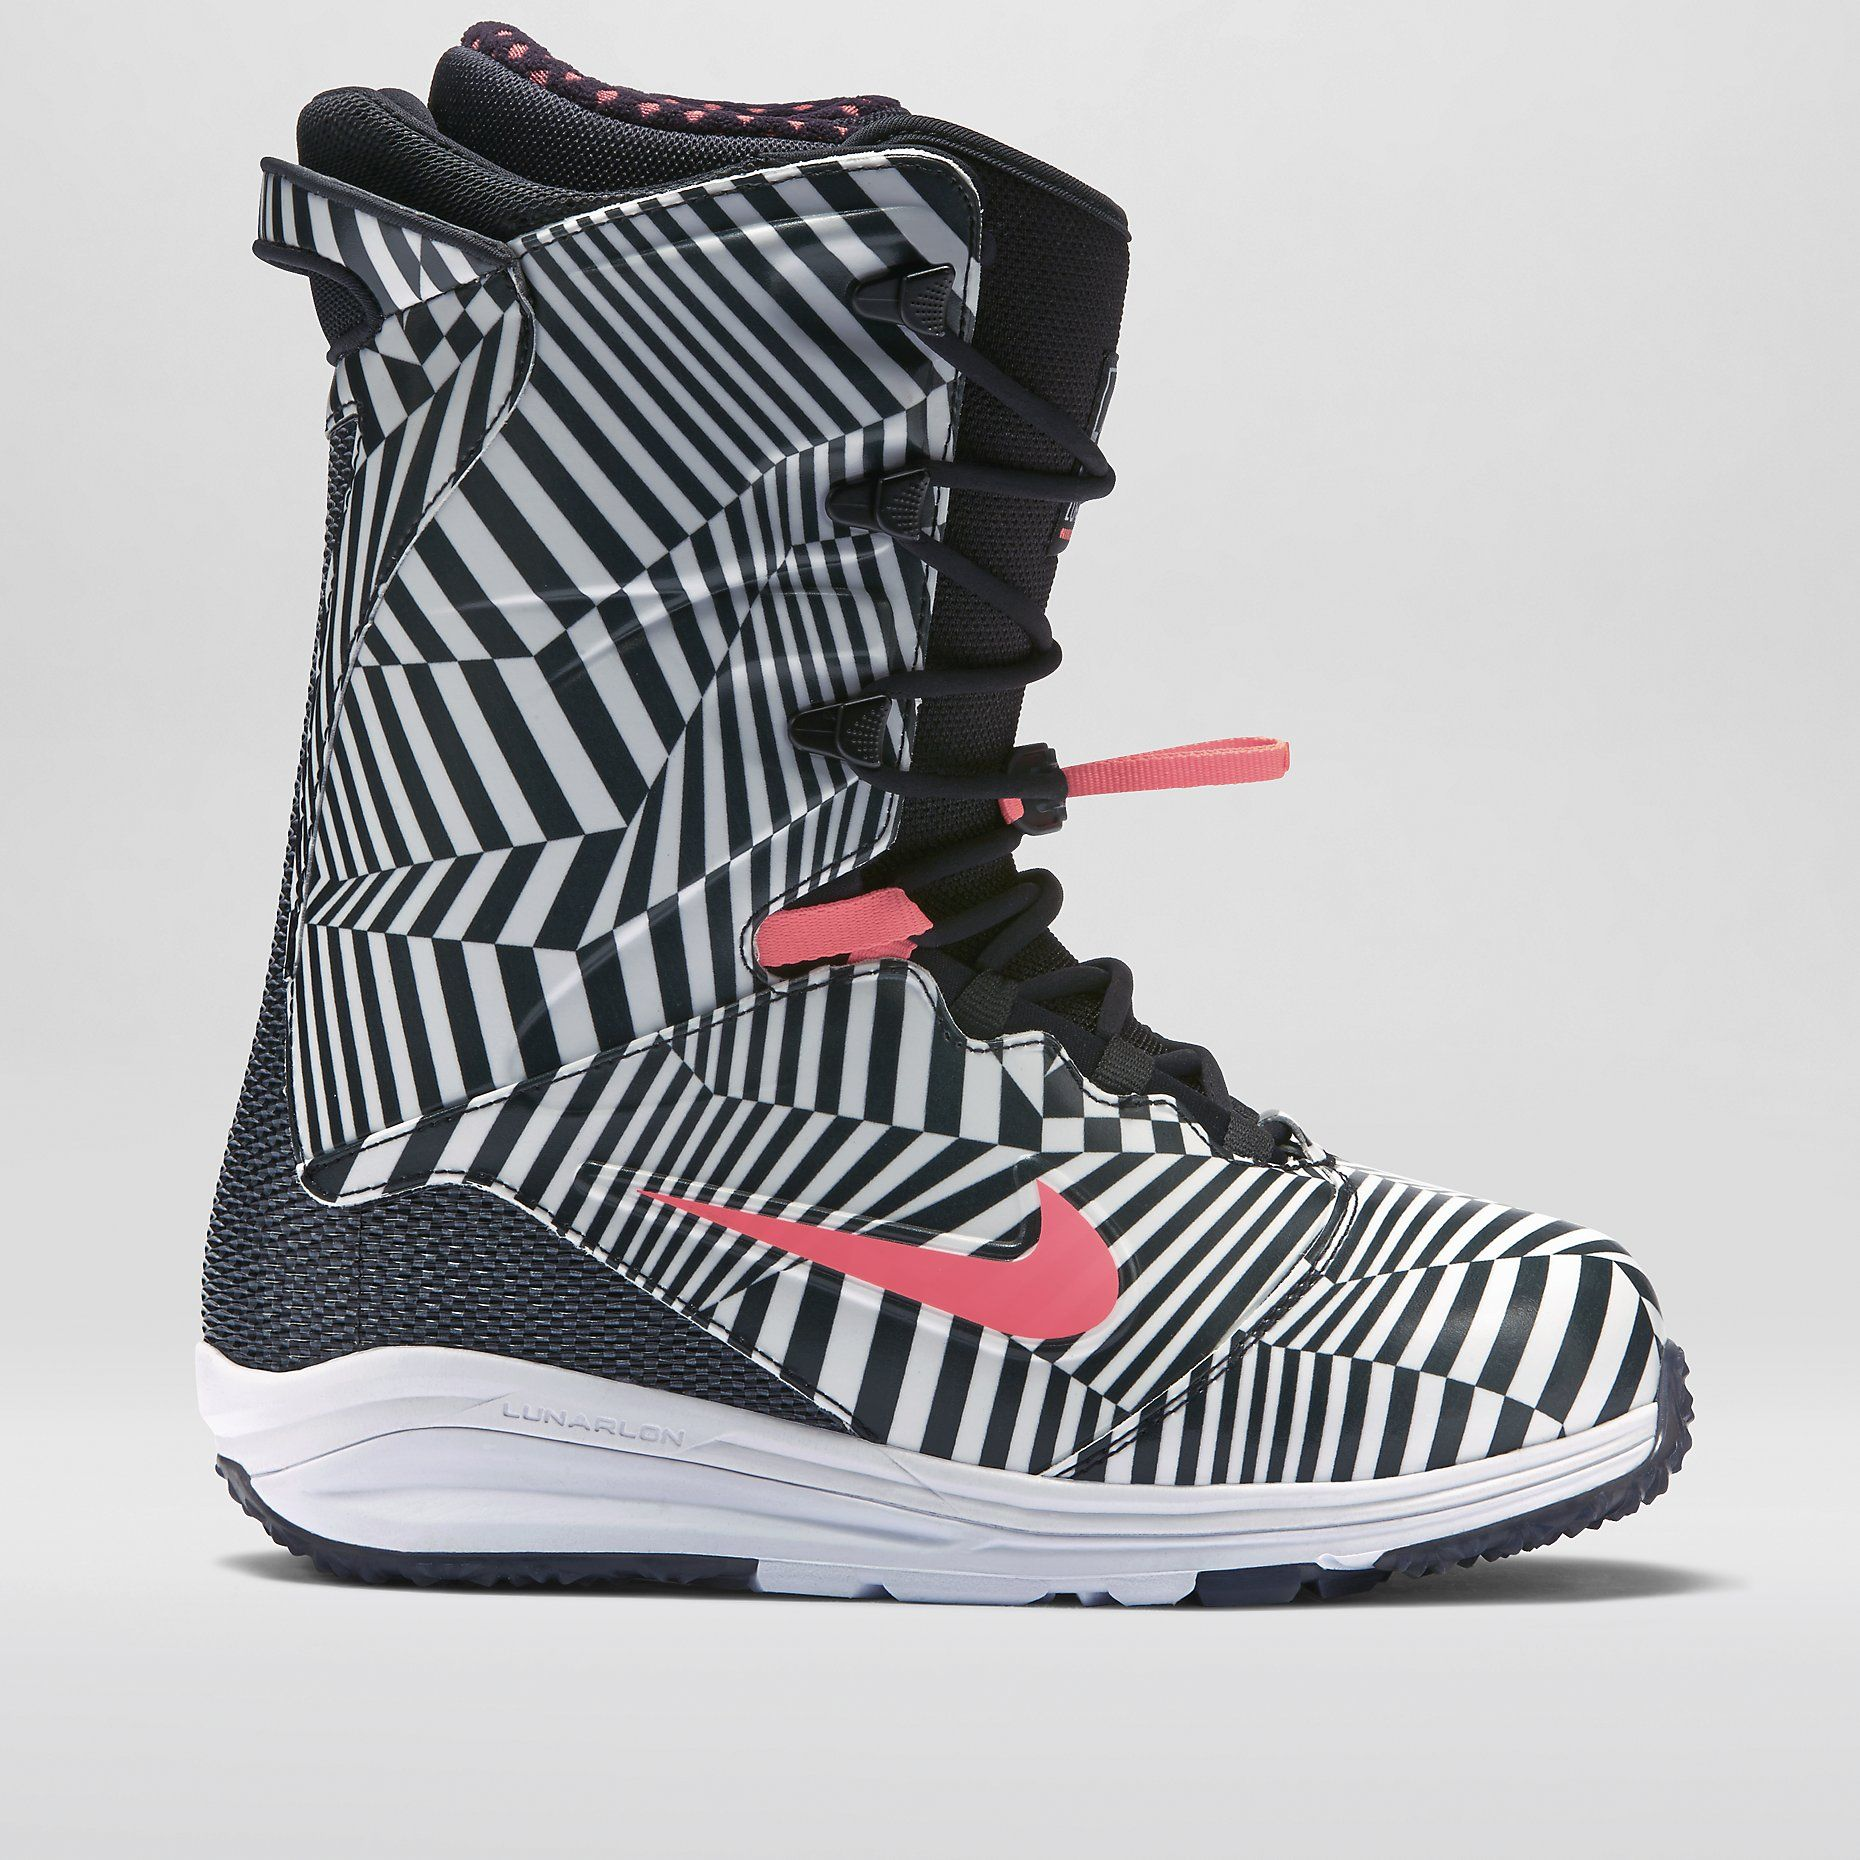 new products c9e9f b833a Nike LunarEndor QS Men s Snowboarding Boot. Nike Store